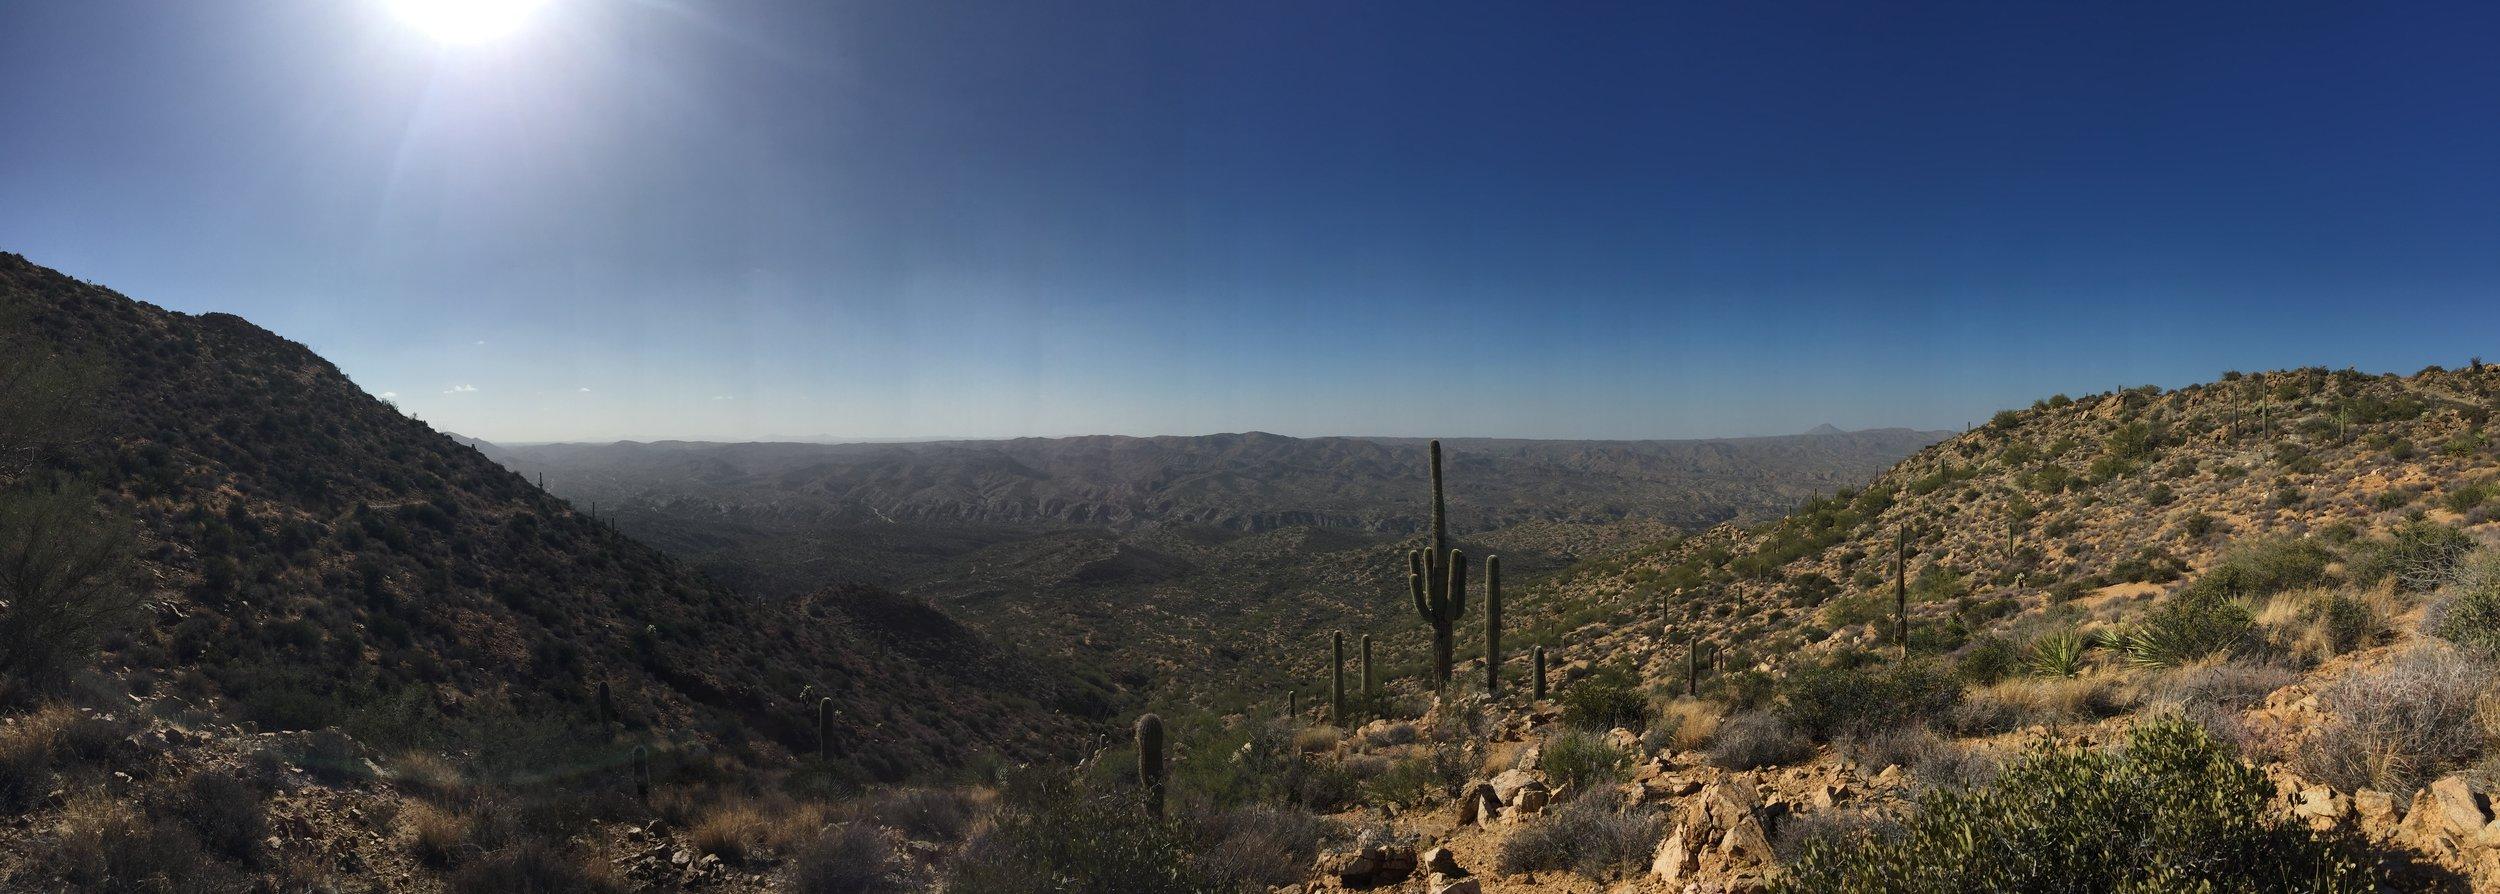 Great vista atop the Big Hill